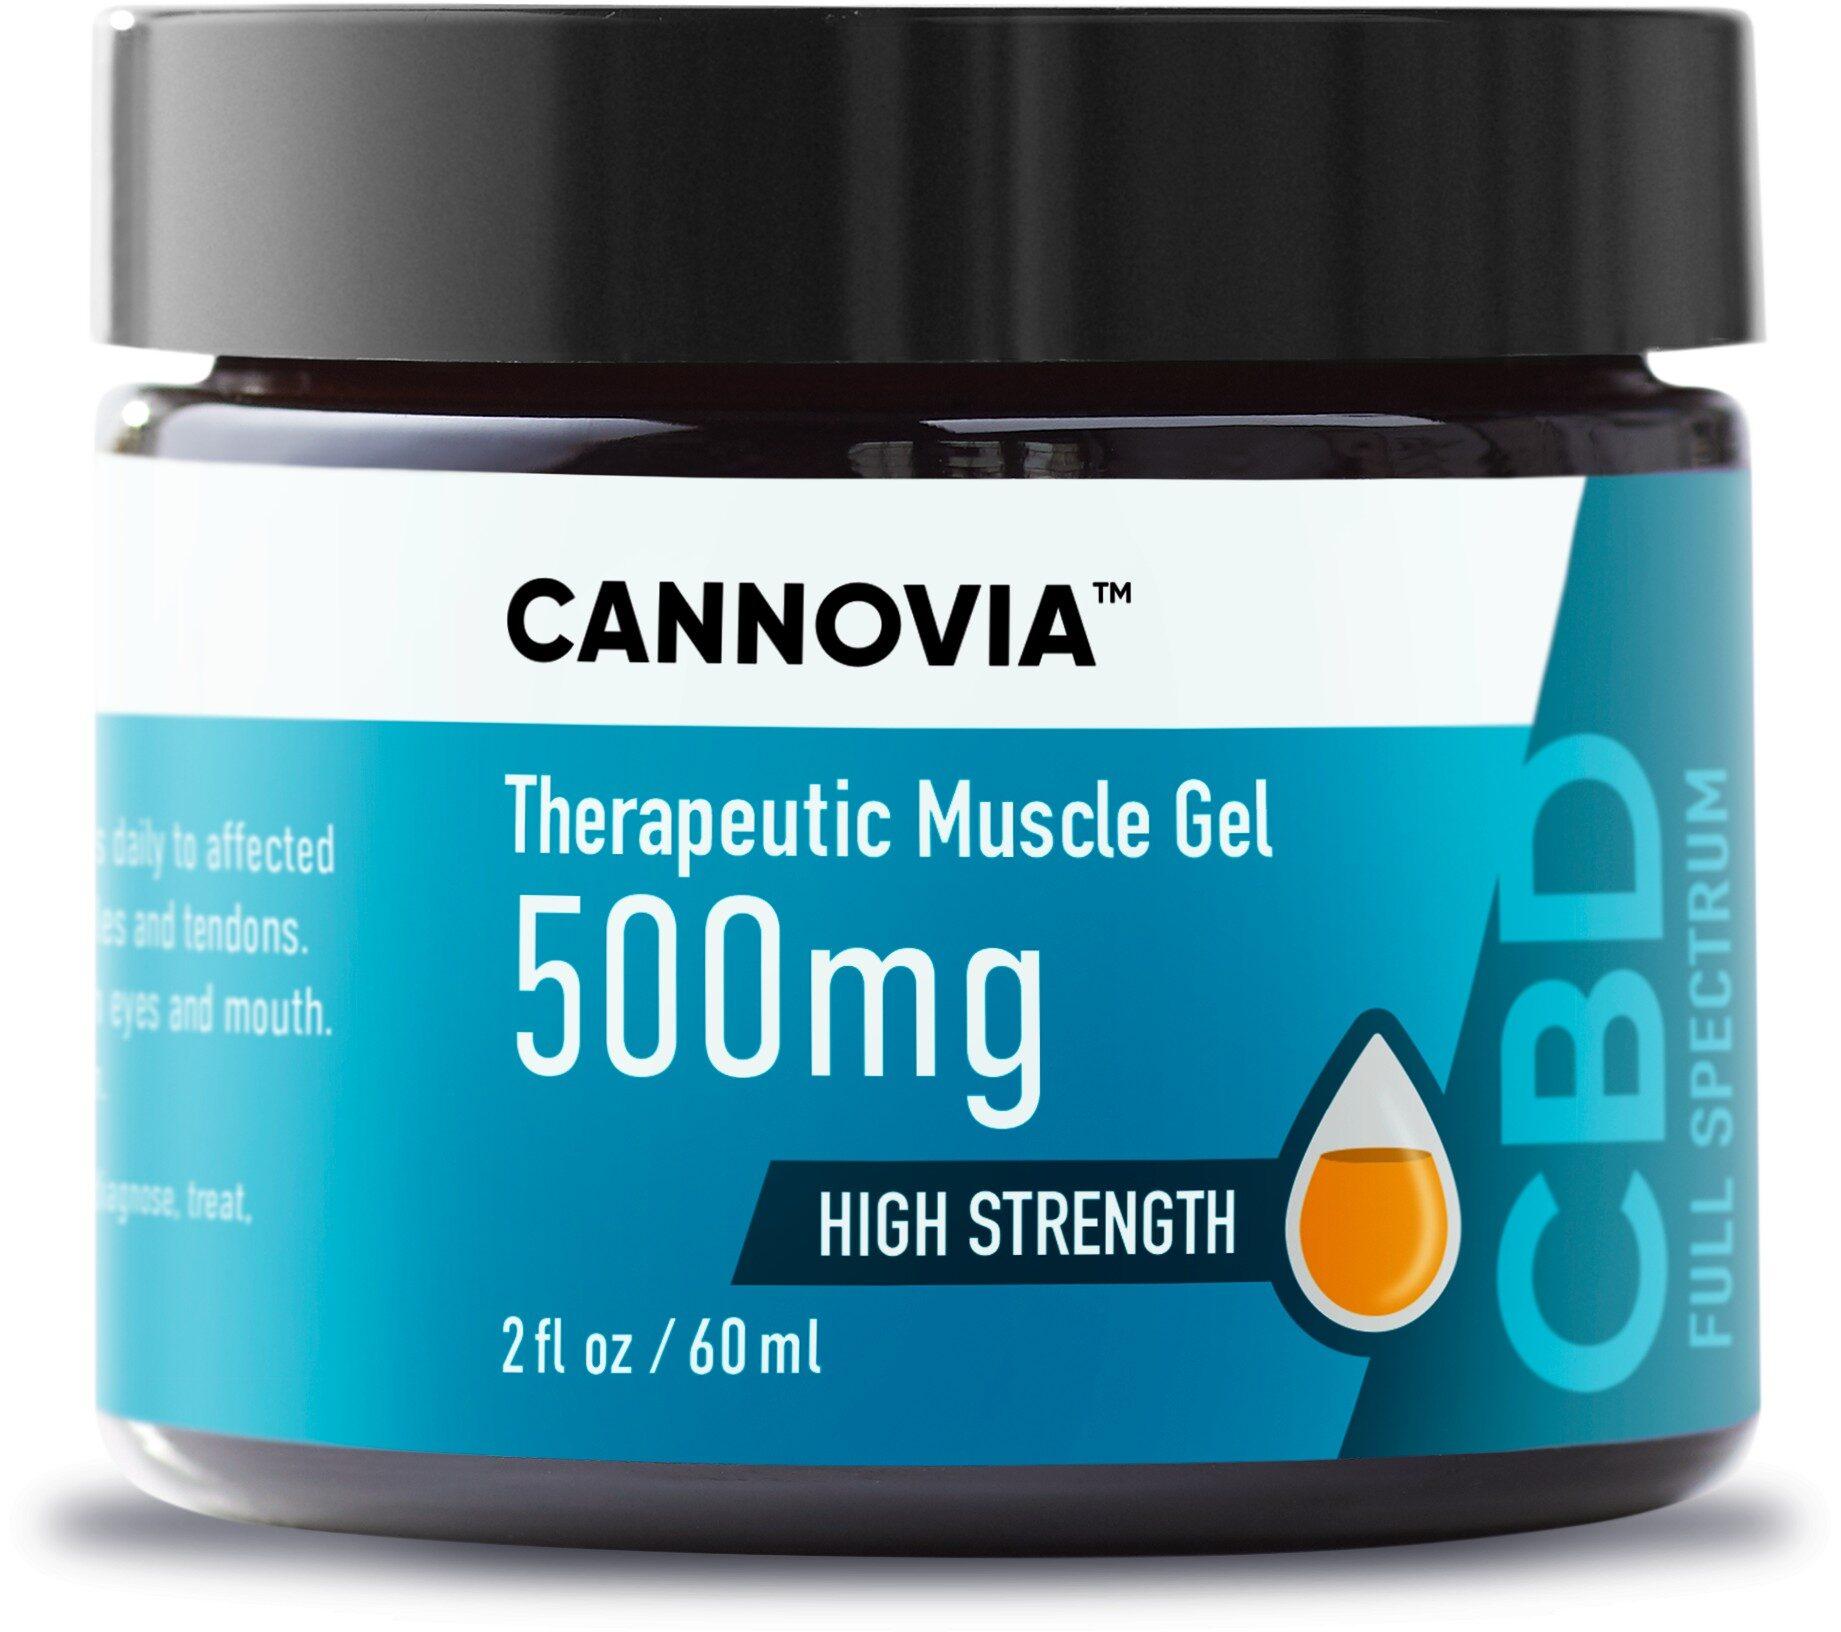 mynd™ MIX • Cannovia CBD - Better Wellness, Naturally